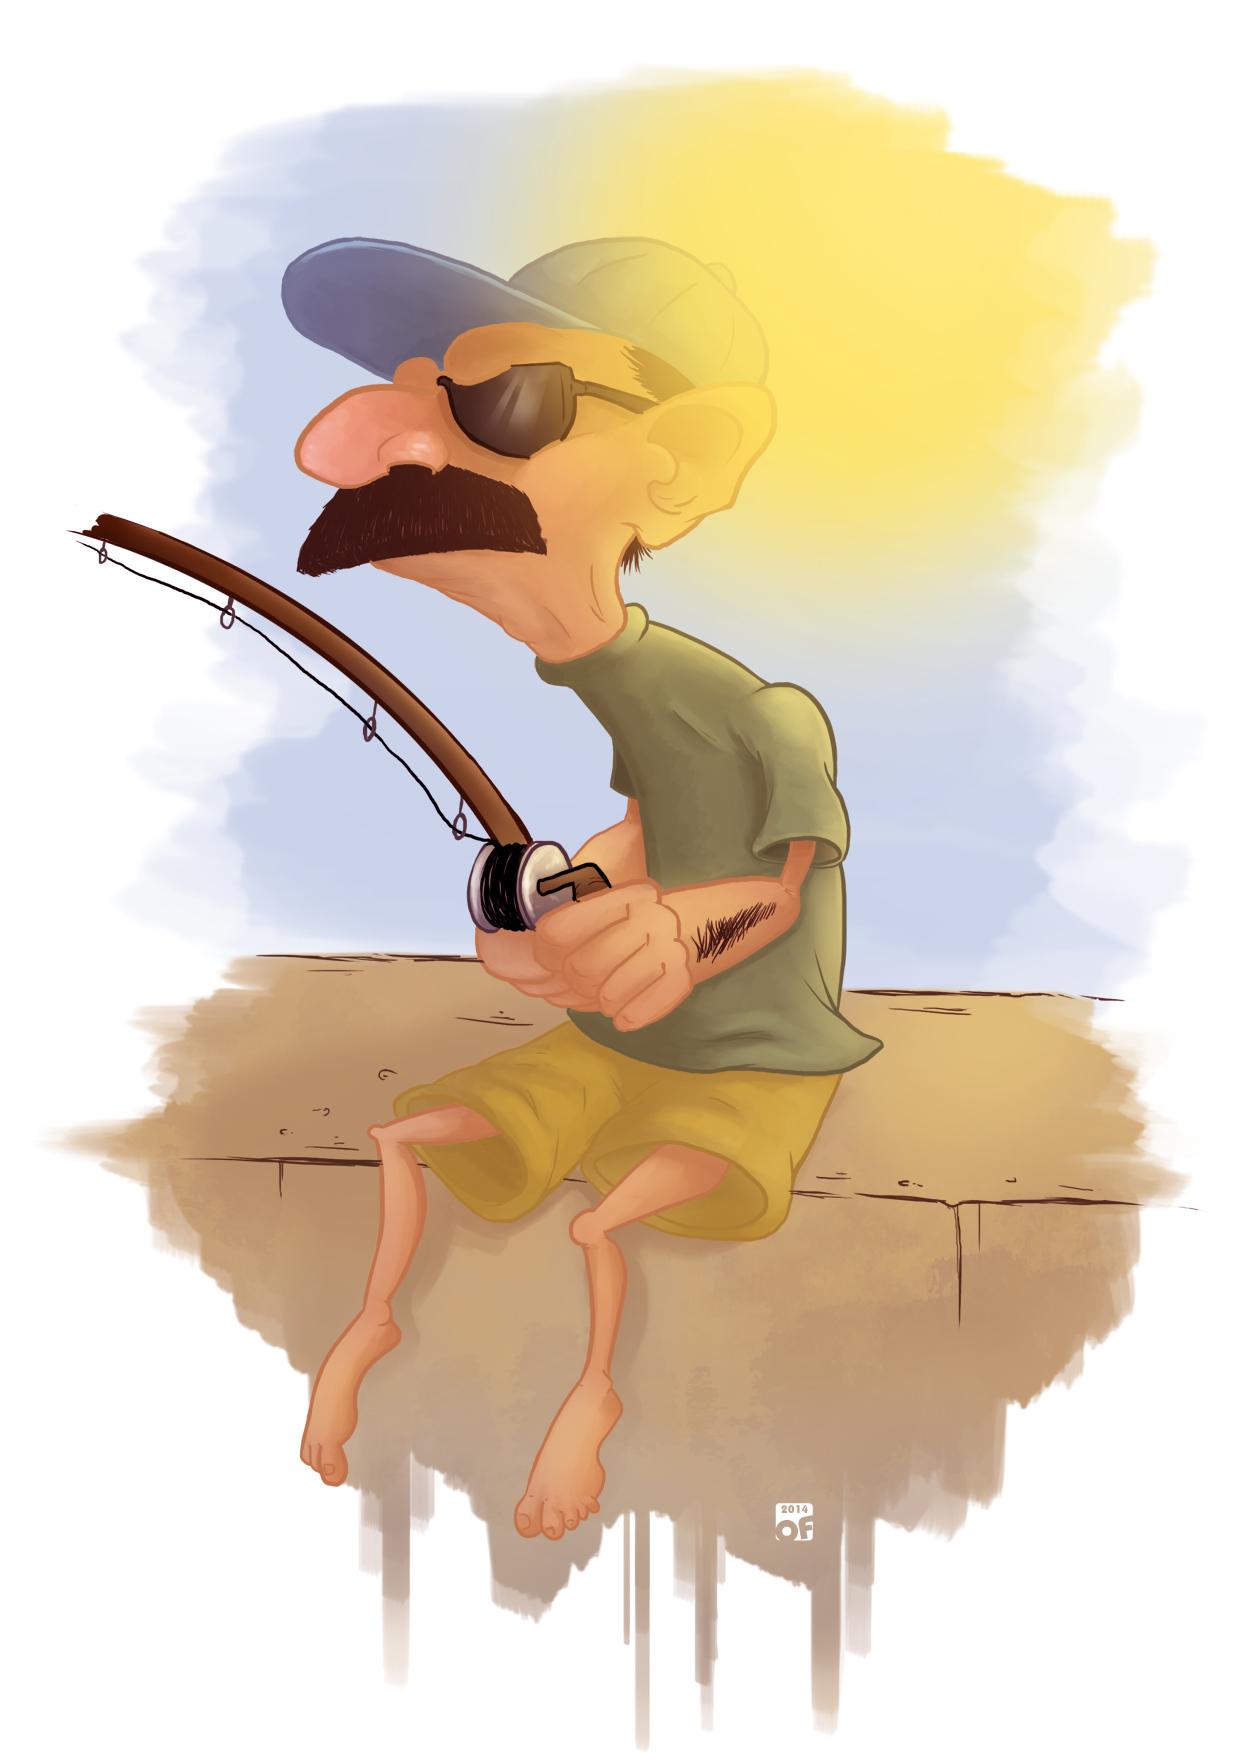 Grumpy Fisherman